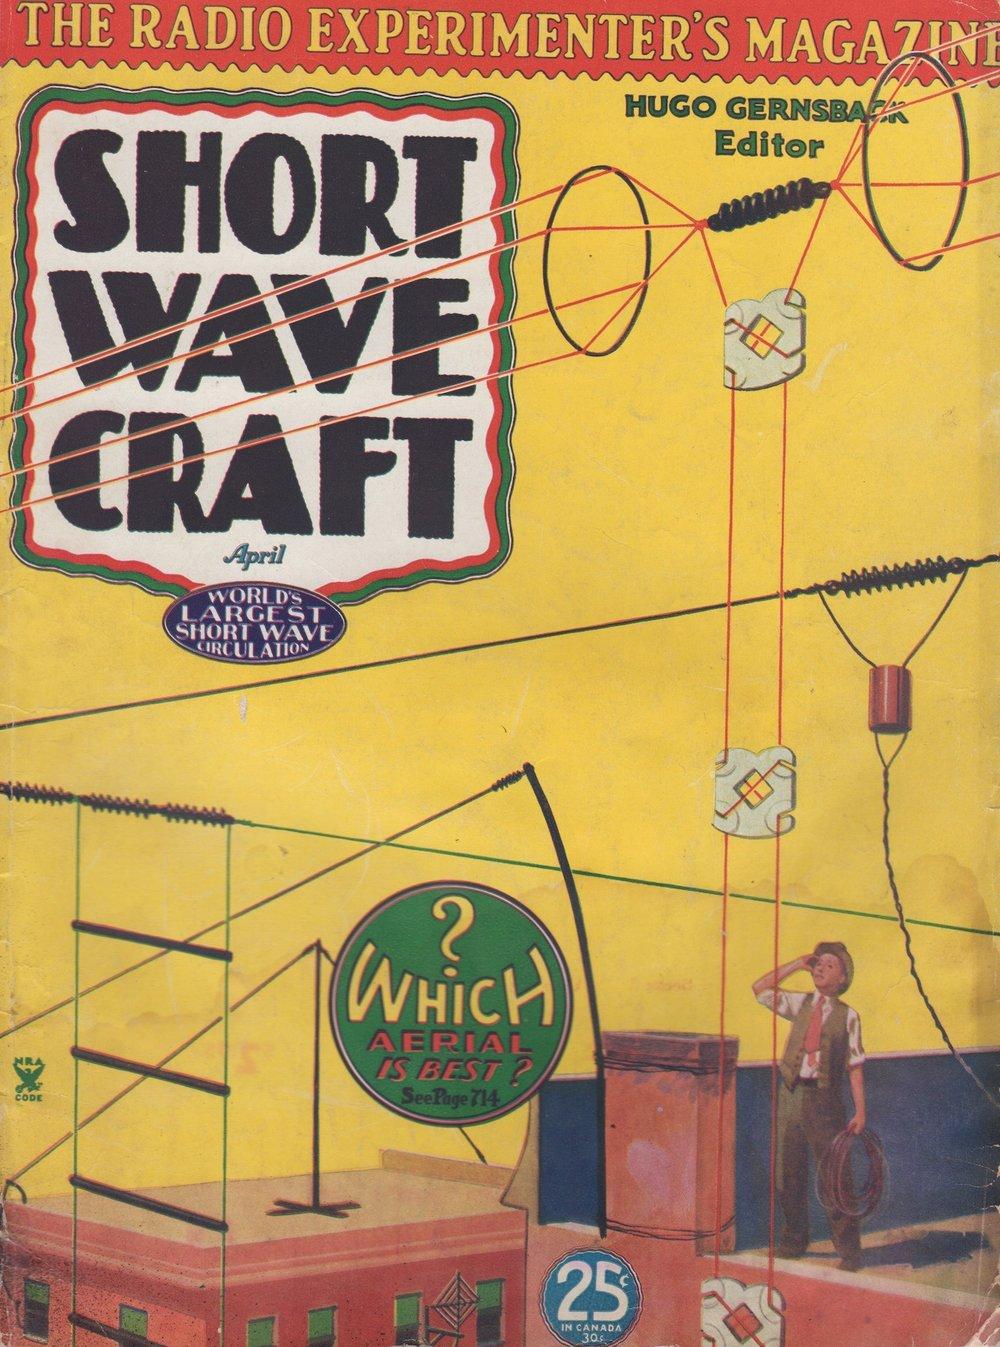 April 1935 issue of  Short Wave Craft  magazine ( Novak Archive )